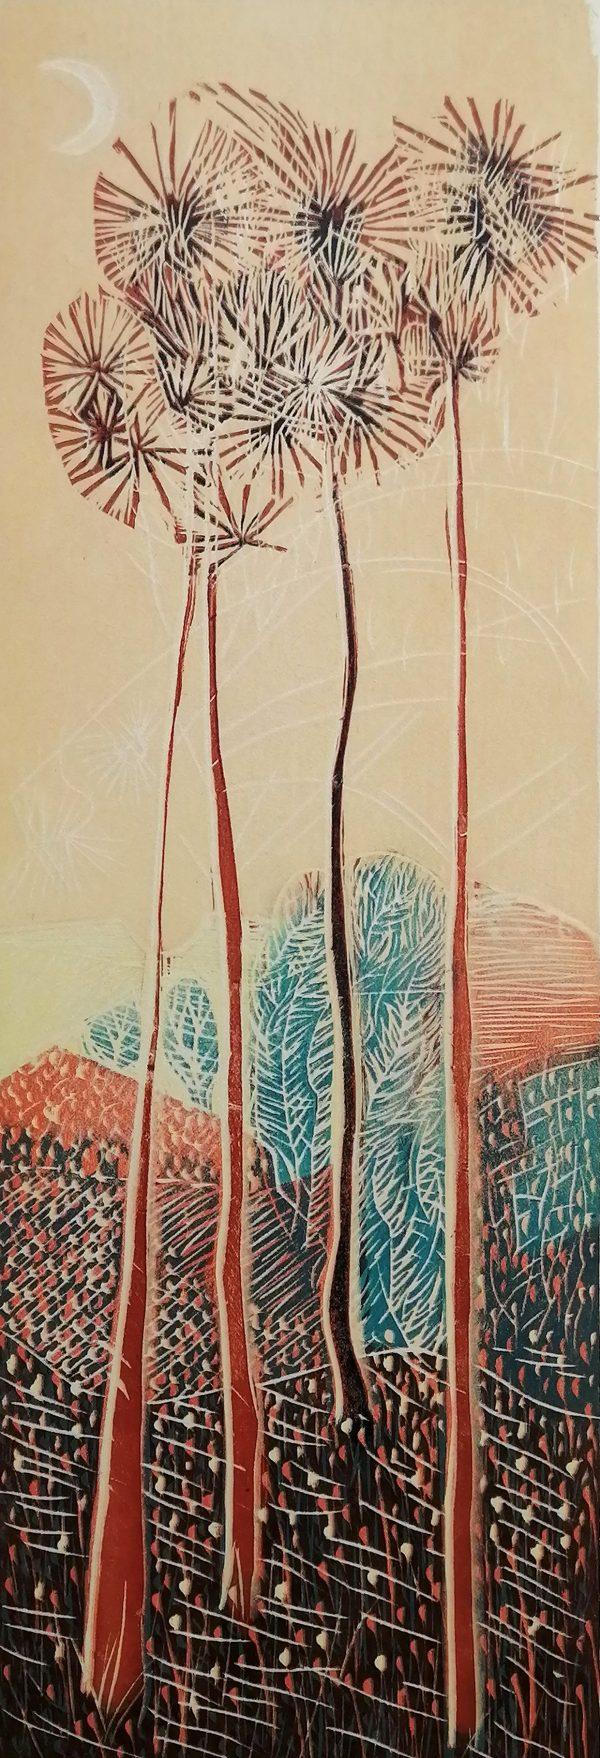 Graphic Studio Dublin: Alentejo Pine